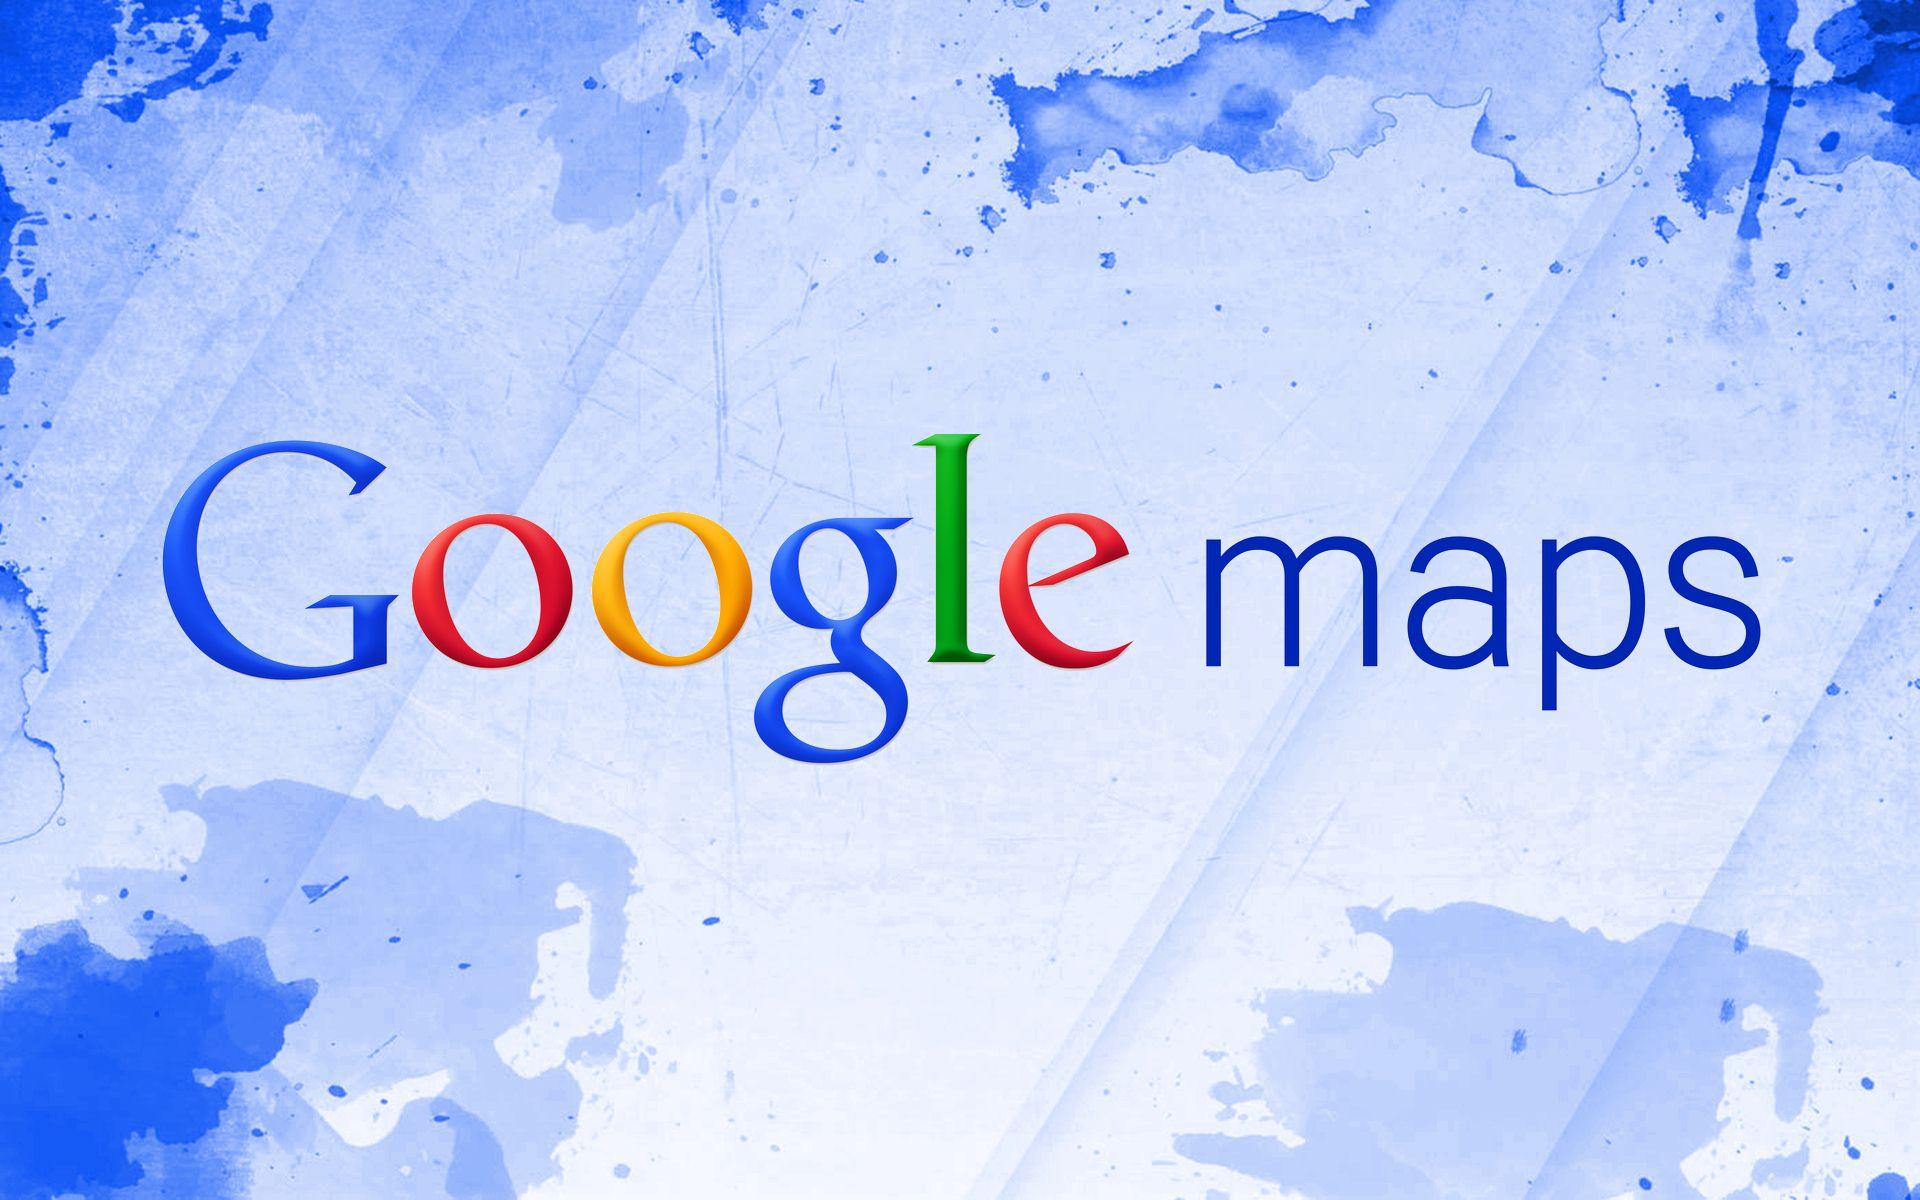 Google-Maps-Logo-Wallpaper